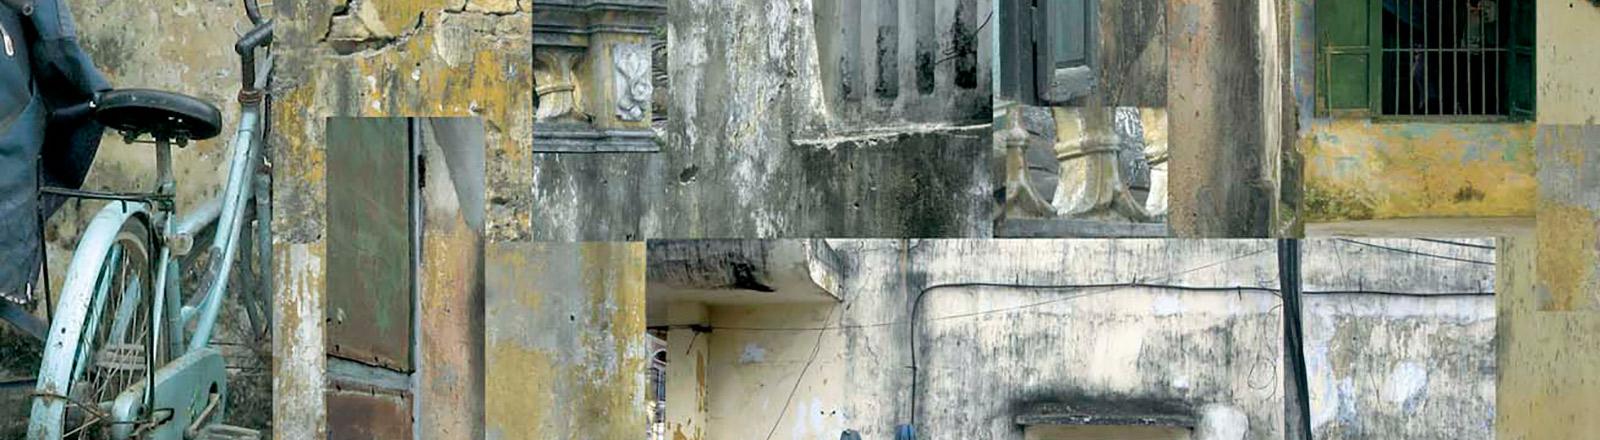 Celia Pearson's Layerings